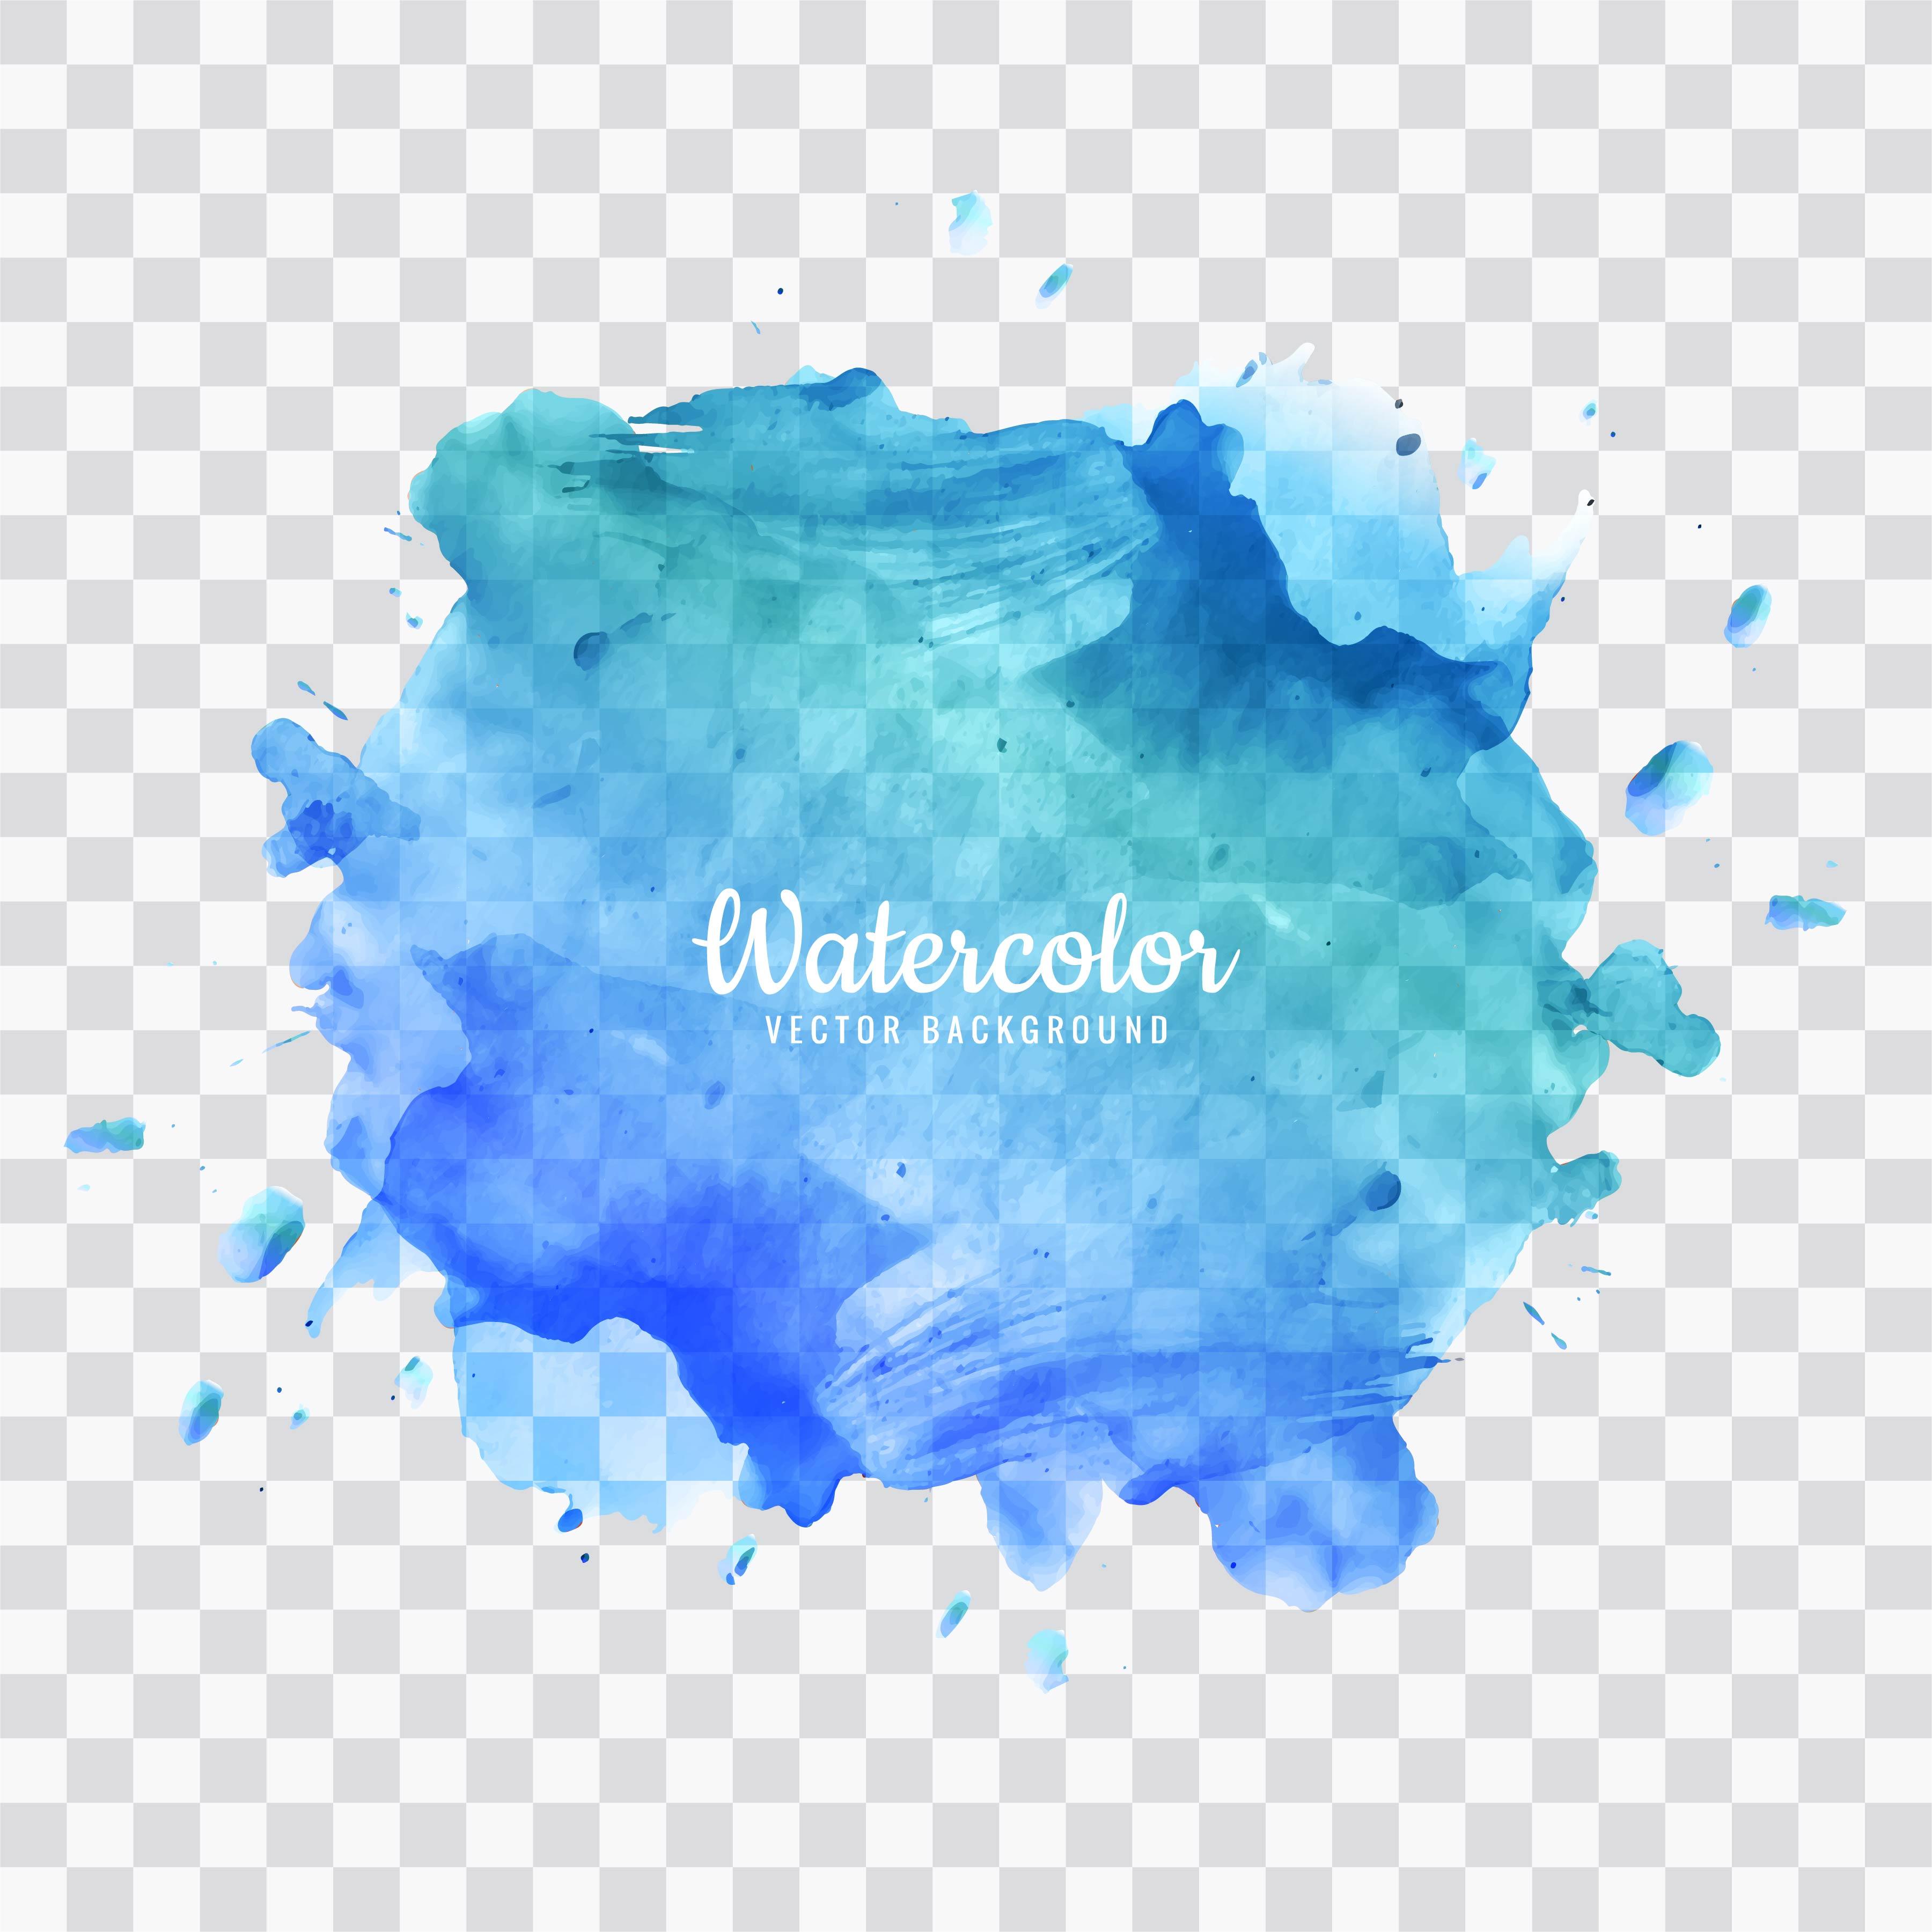 Blue Watercolor Splash Background Download Free Vectors Clipart Graphics Vector Art